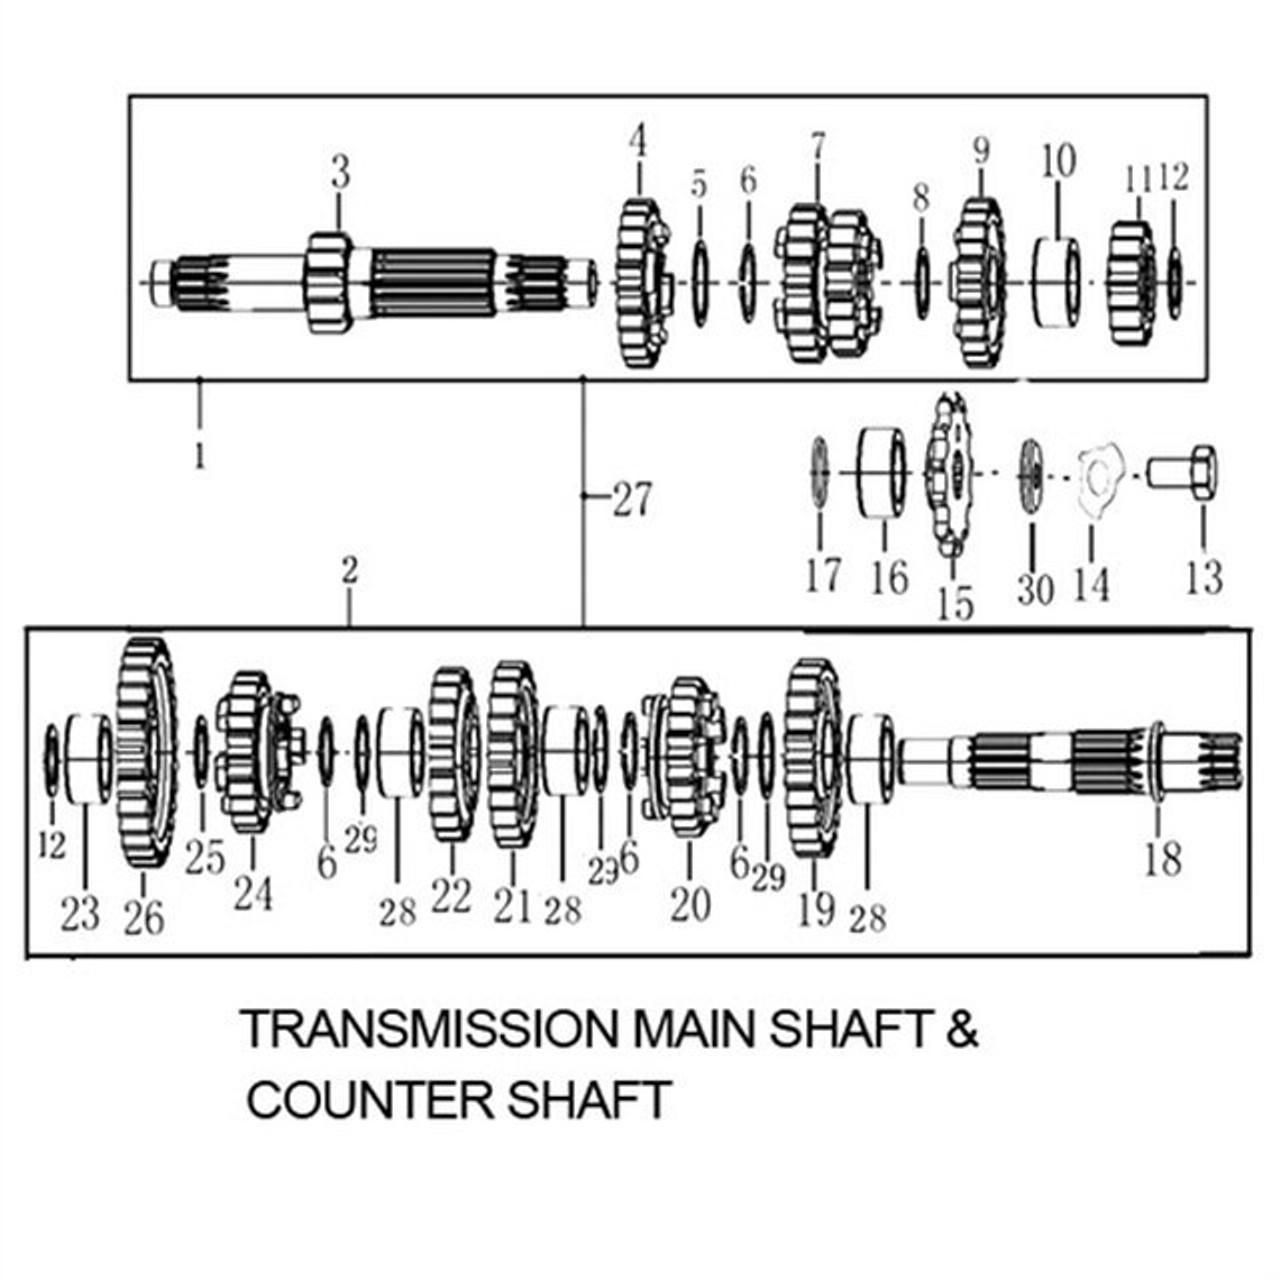 TRANSMISSION MAIN SHAFT & COUNTER SHAFT